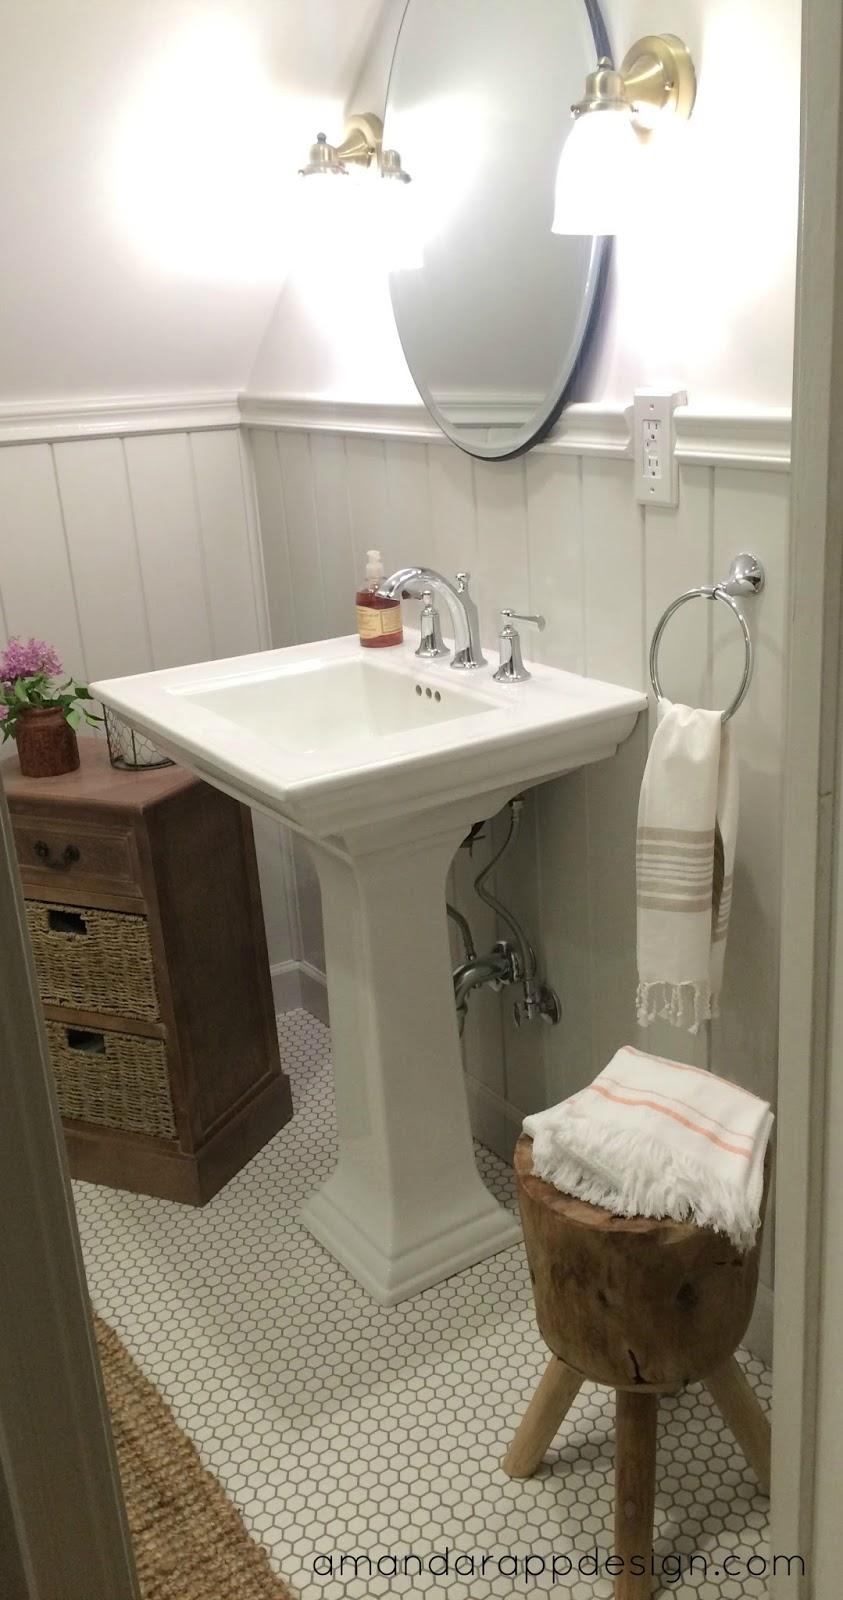 Elliston Pedestal Sink : We splurged on a custom glass shower door and couldnt be more pleased ...